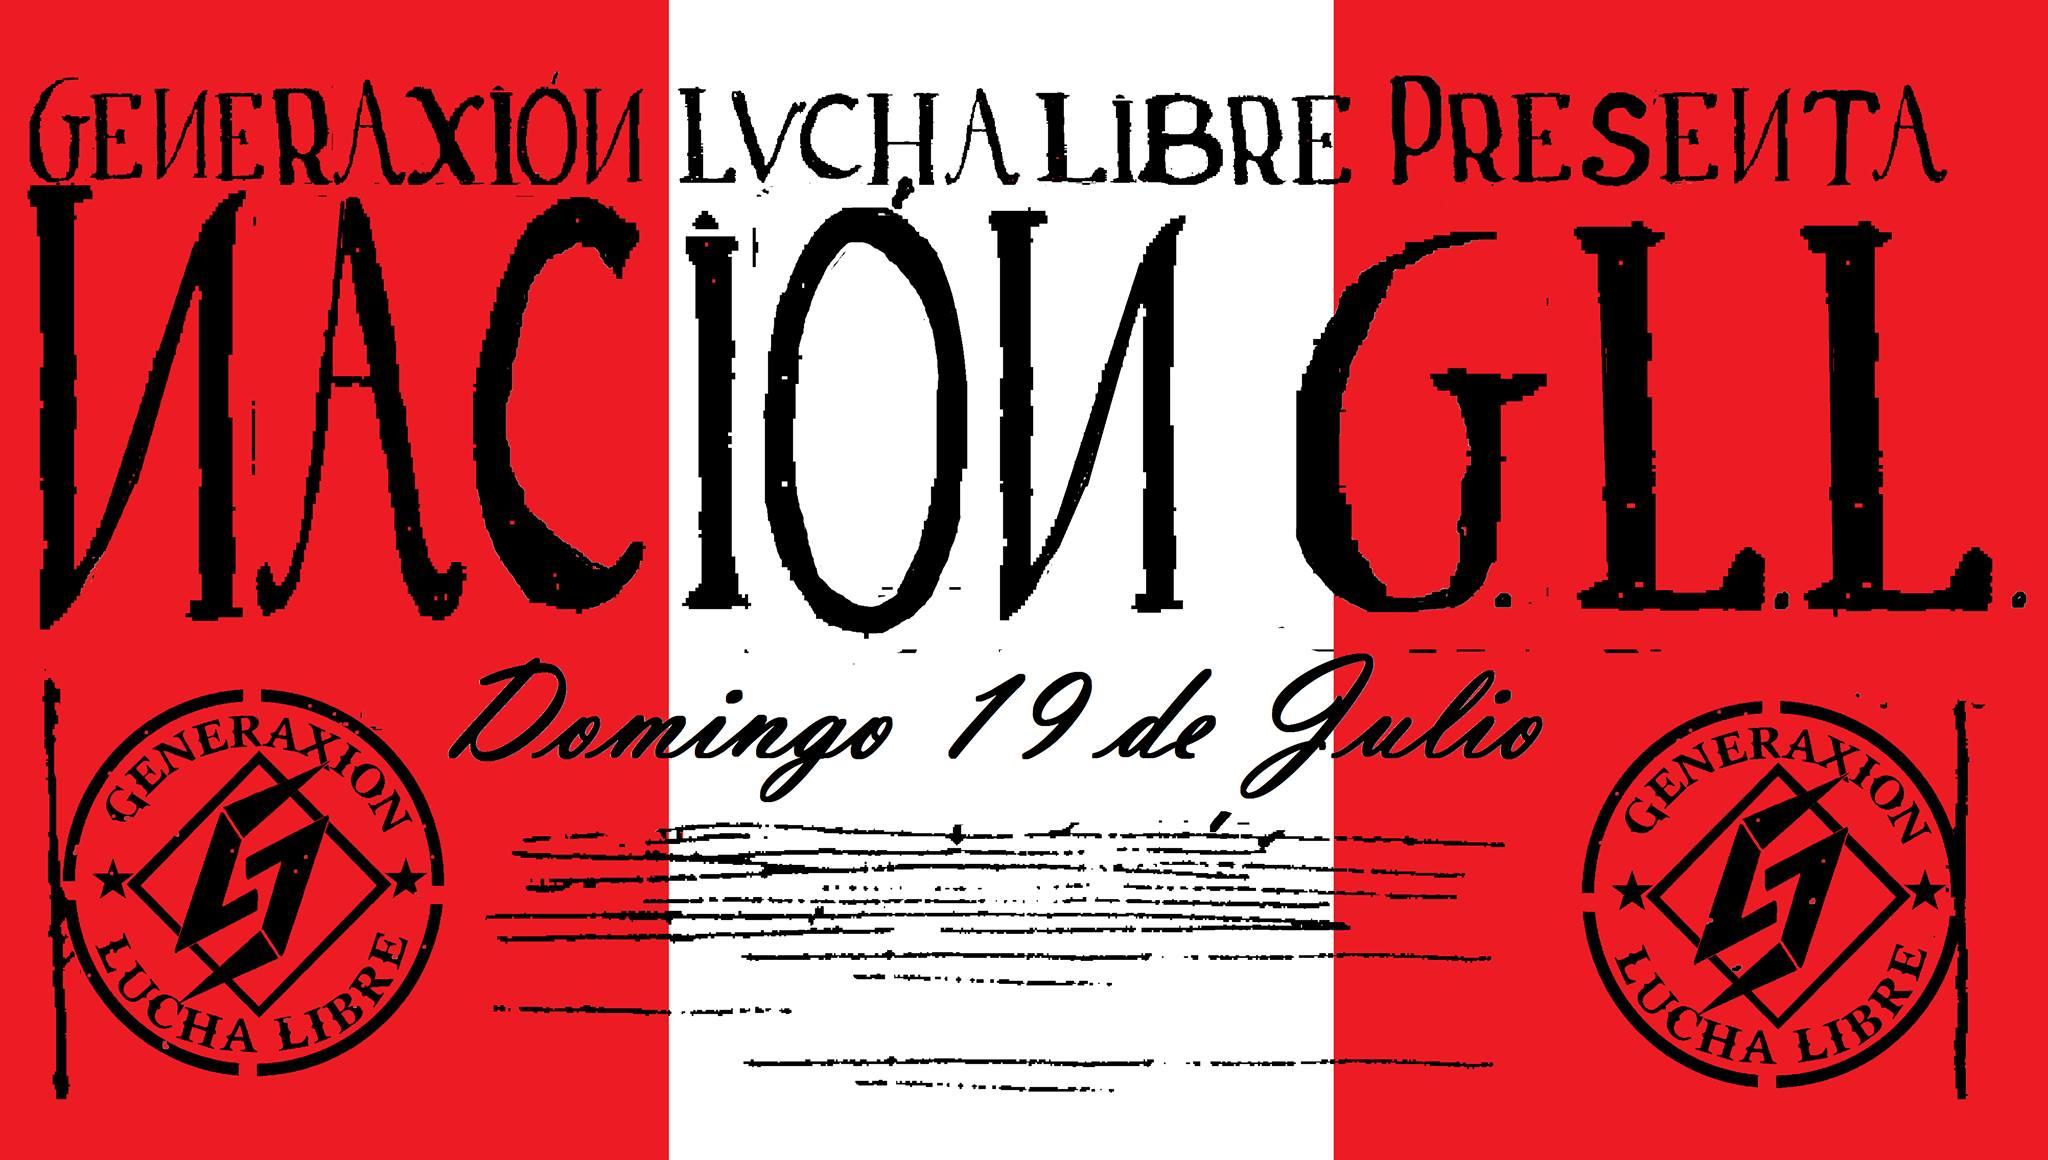 Poster del evento Nación GLL